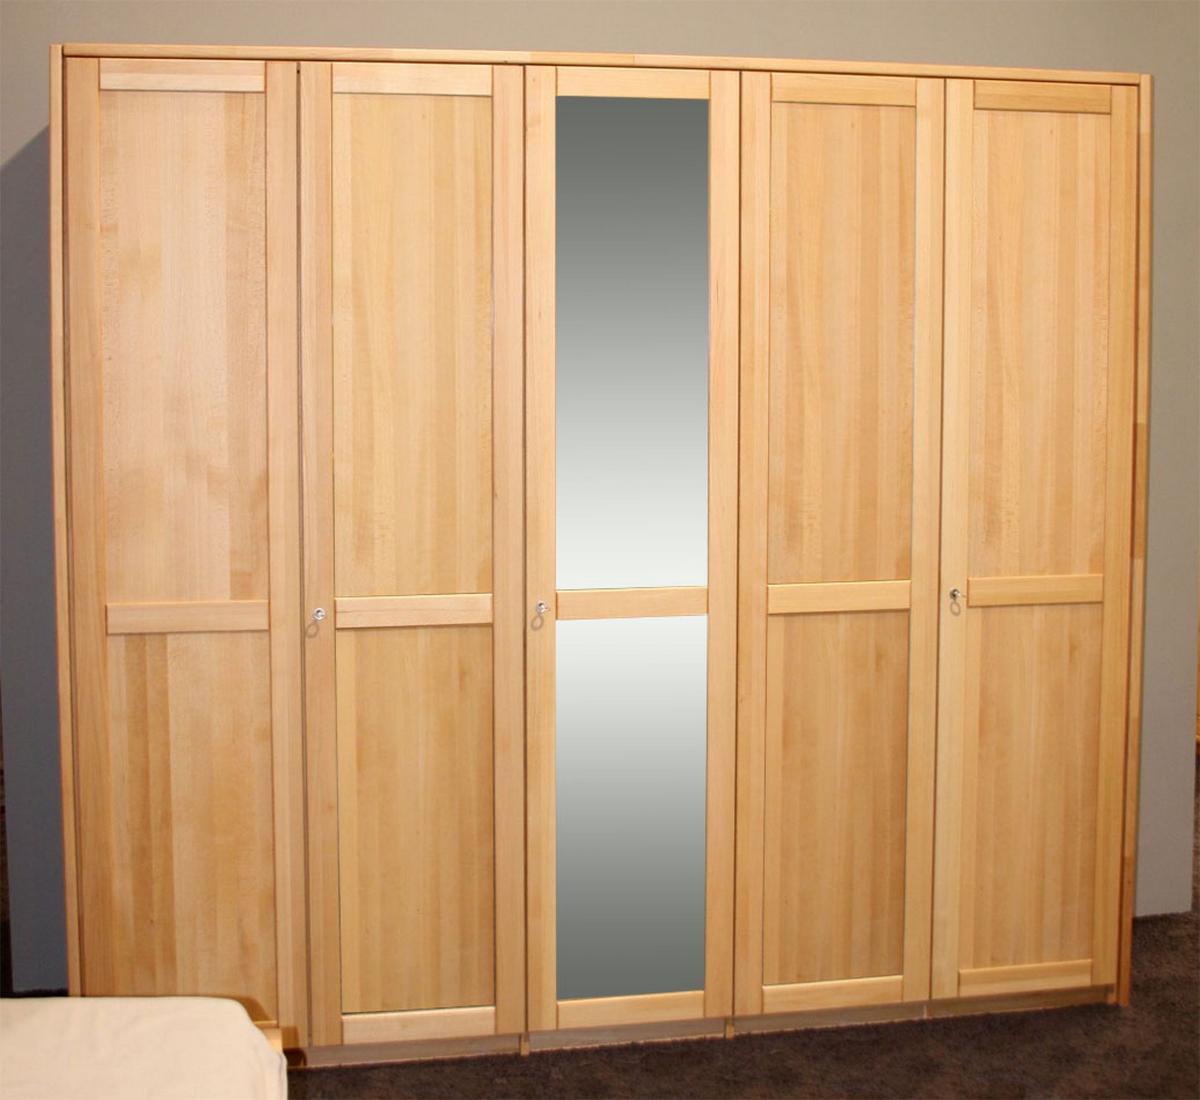 echtholz kleiderschrank mit spiegel buche massiv ge lt. Black Bedroom Furniture Sets. Home Design Ideas